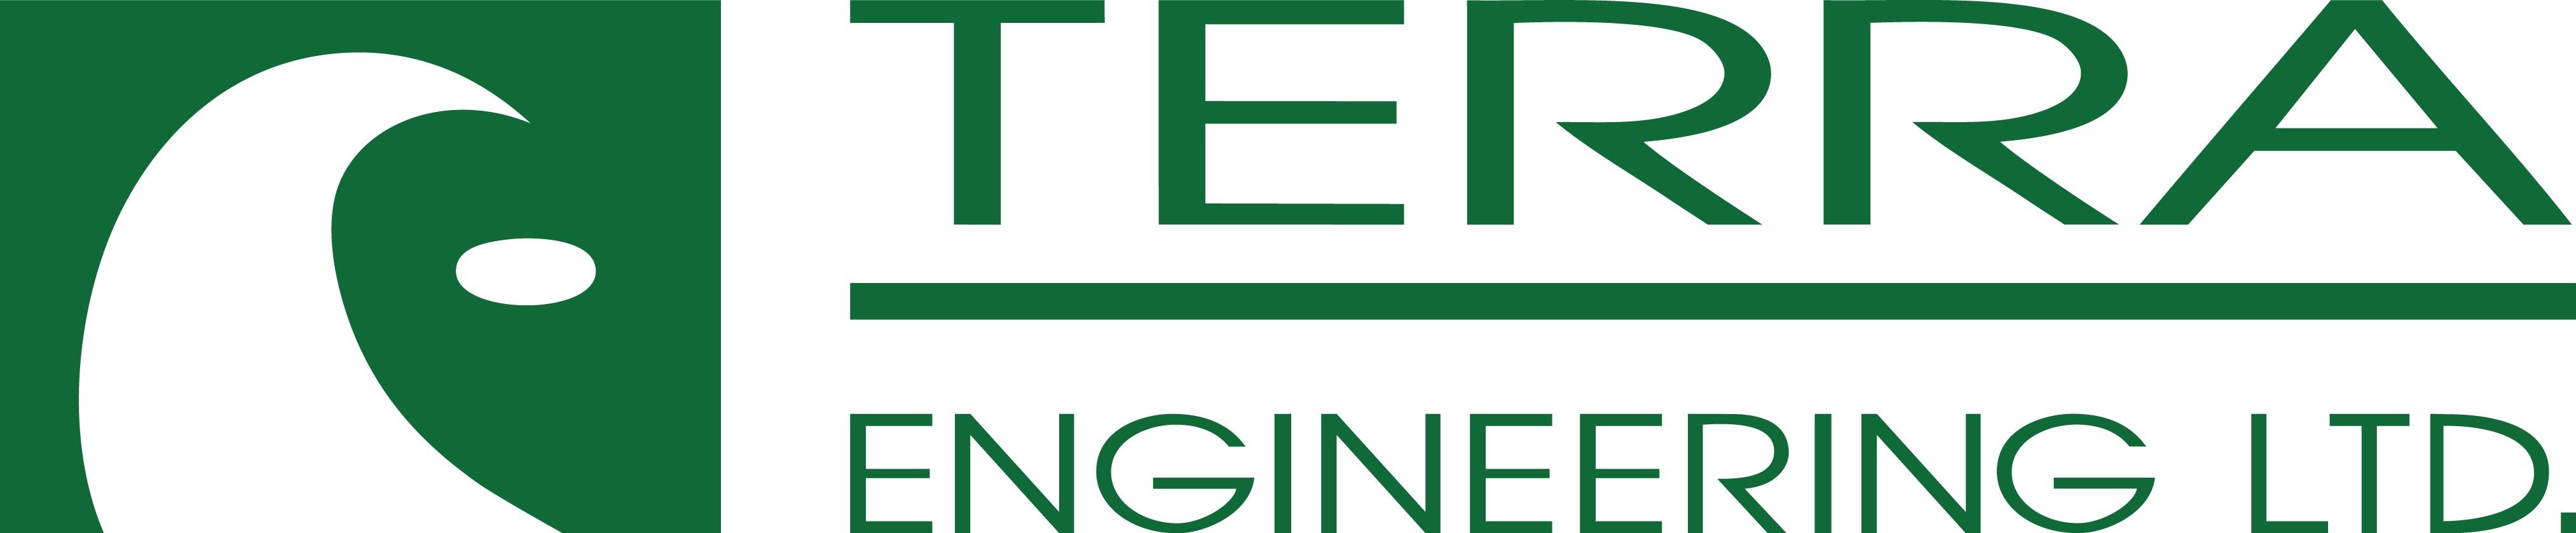 TERRA Logo - green (HiRes for print)